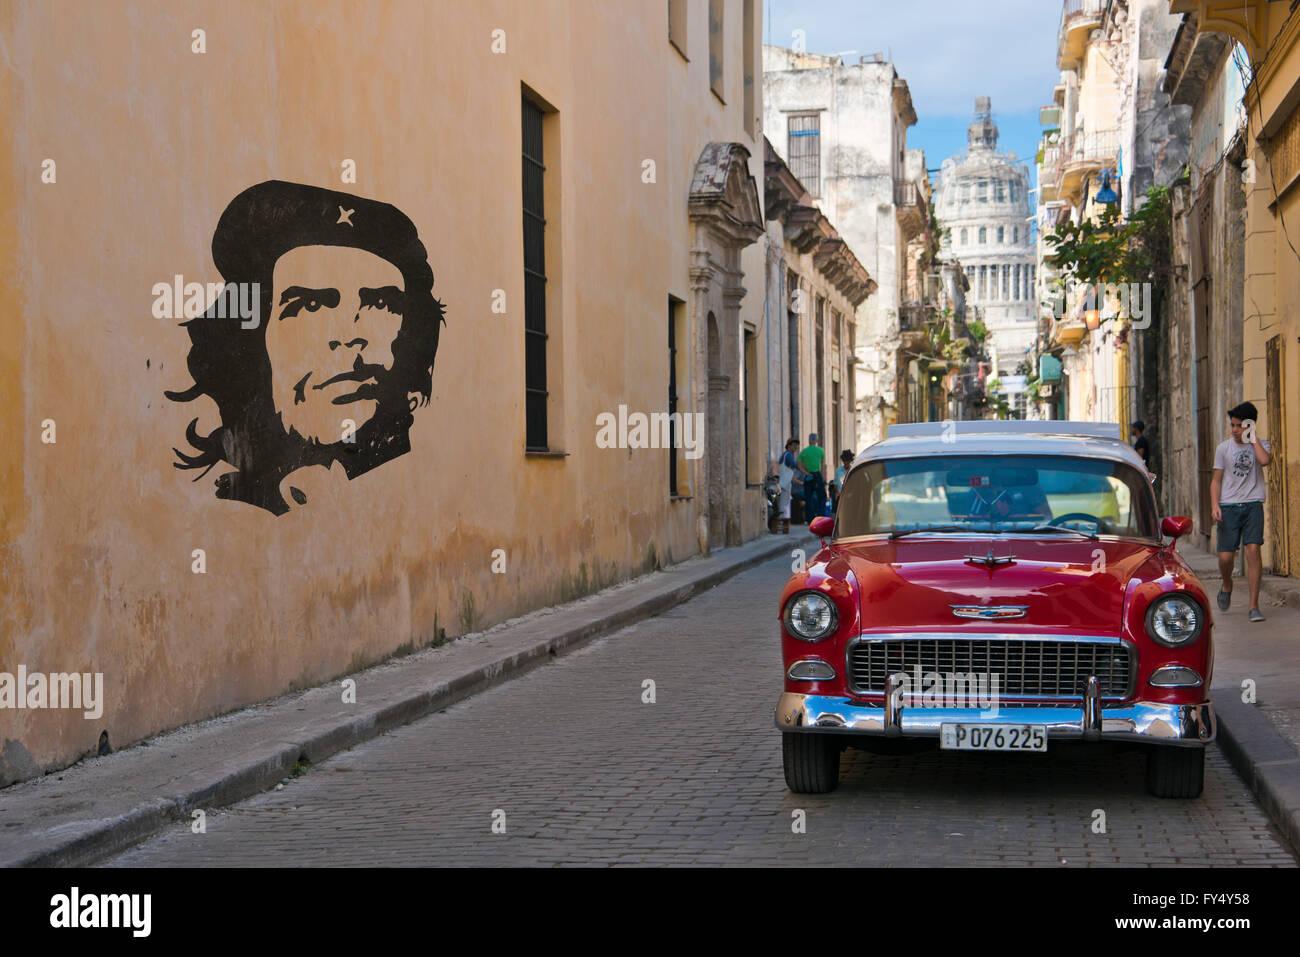 Horizontal streetscape in Old Havana, Cuba. - Stock Image